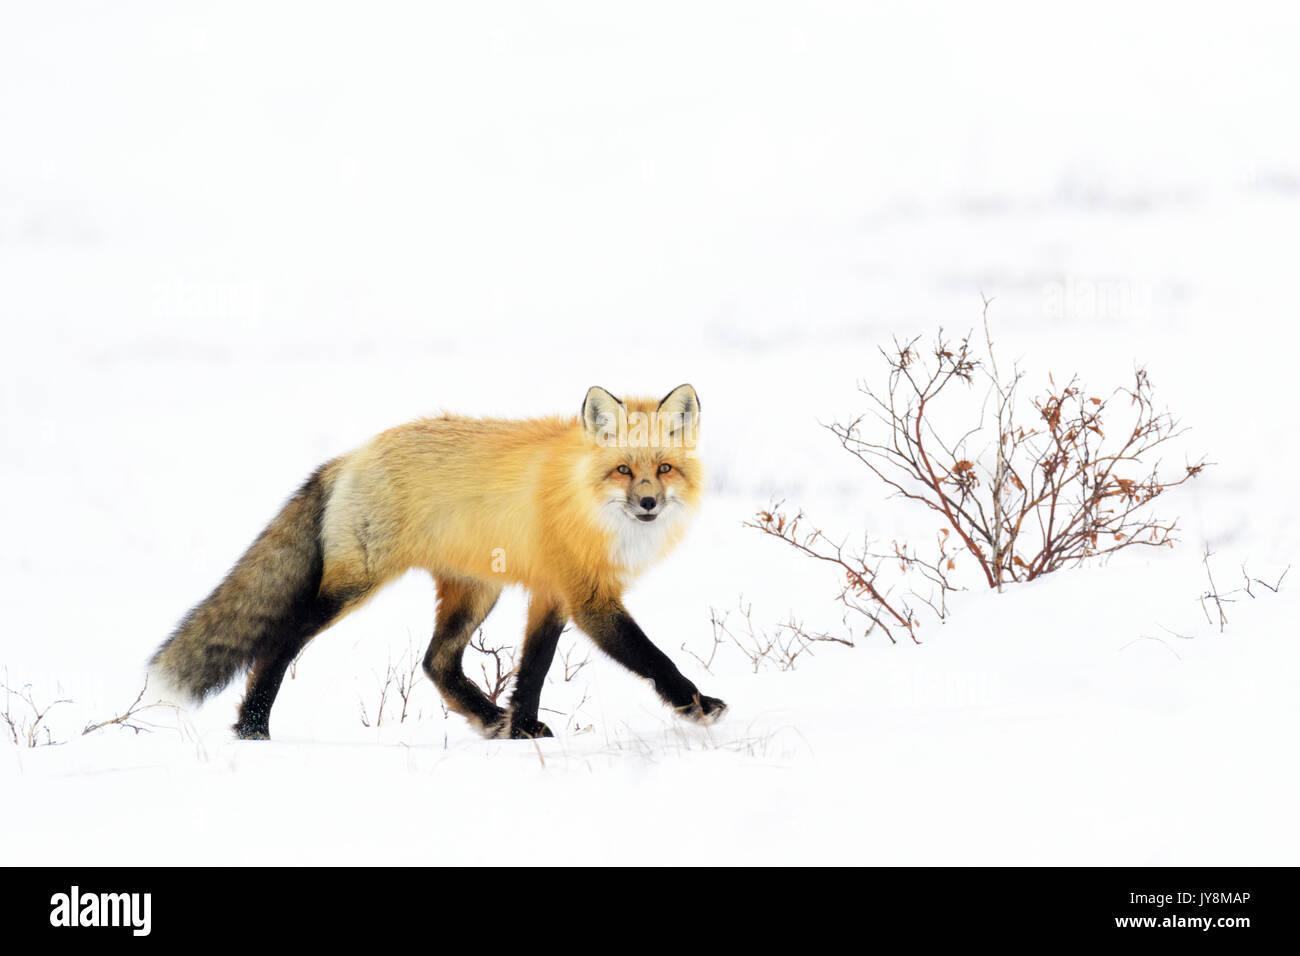 Red Fox (Vulpes vulpes) adult, walking in snow looking at camera, Churchill, Manitoba, Canada - Stock Image